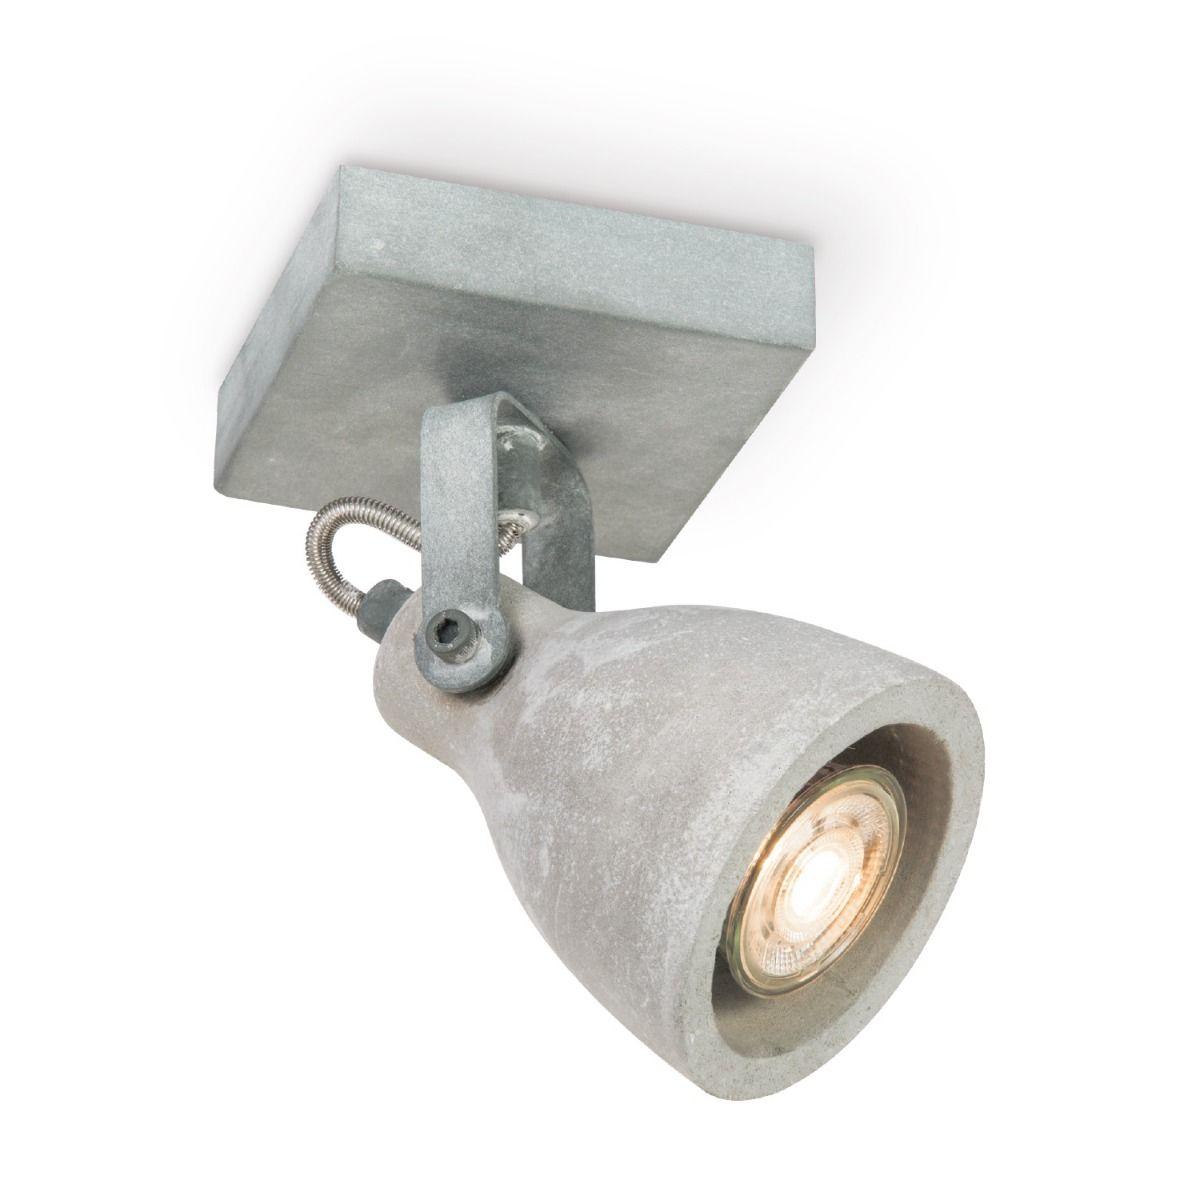 Home sweet home LED opbouwspot Vedi ↔ 9,5 cm - betongrijs